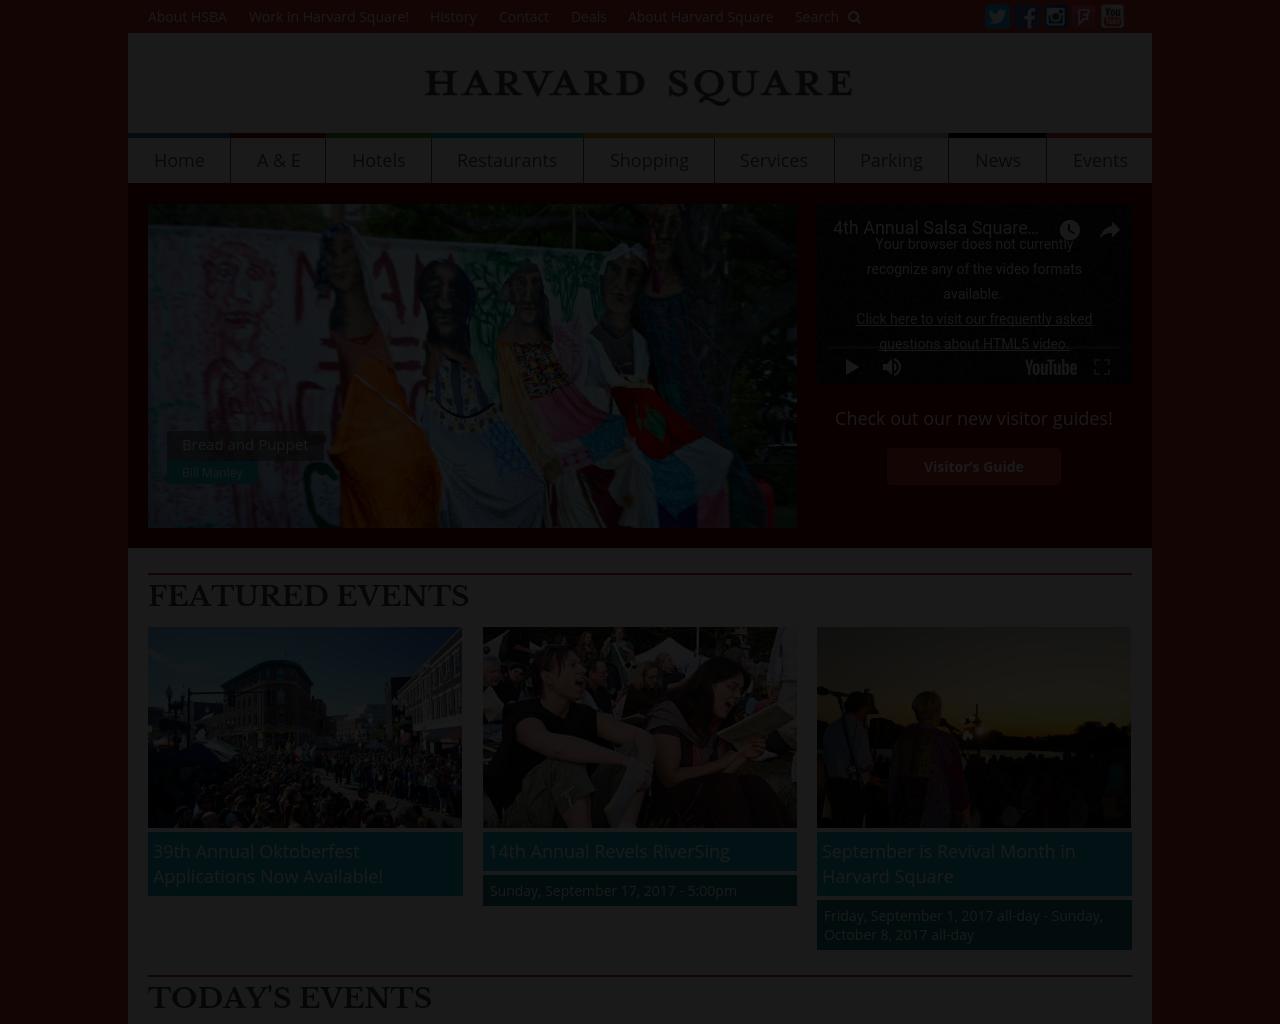 HARVARD-SQUARE-Advertising-Reviews-Pricing